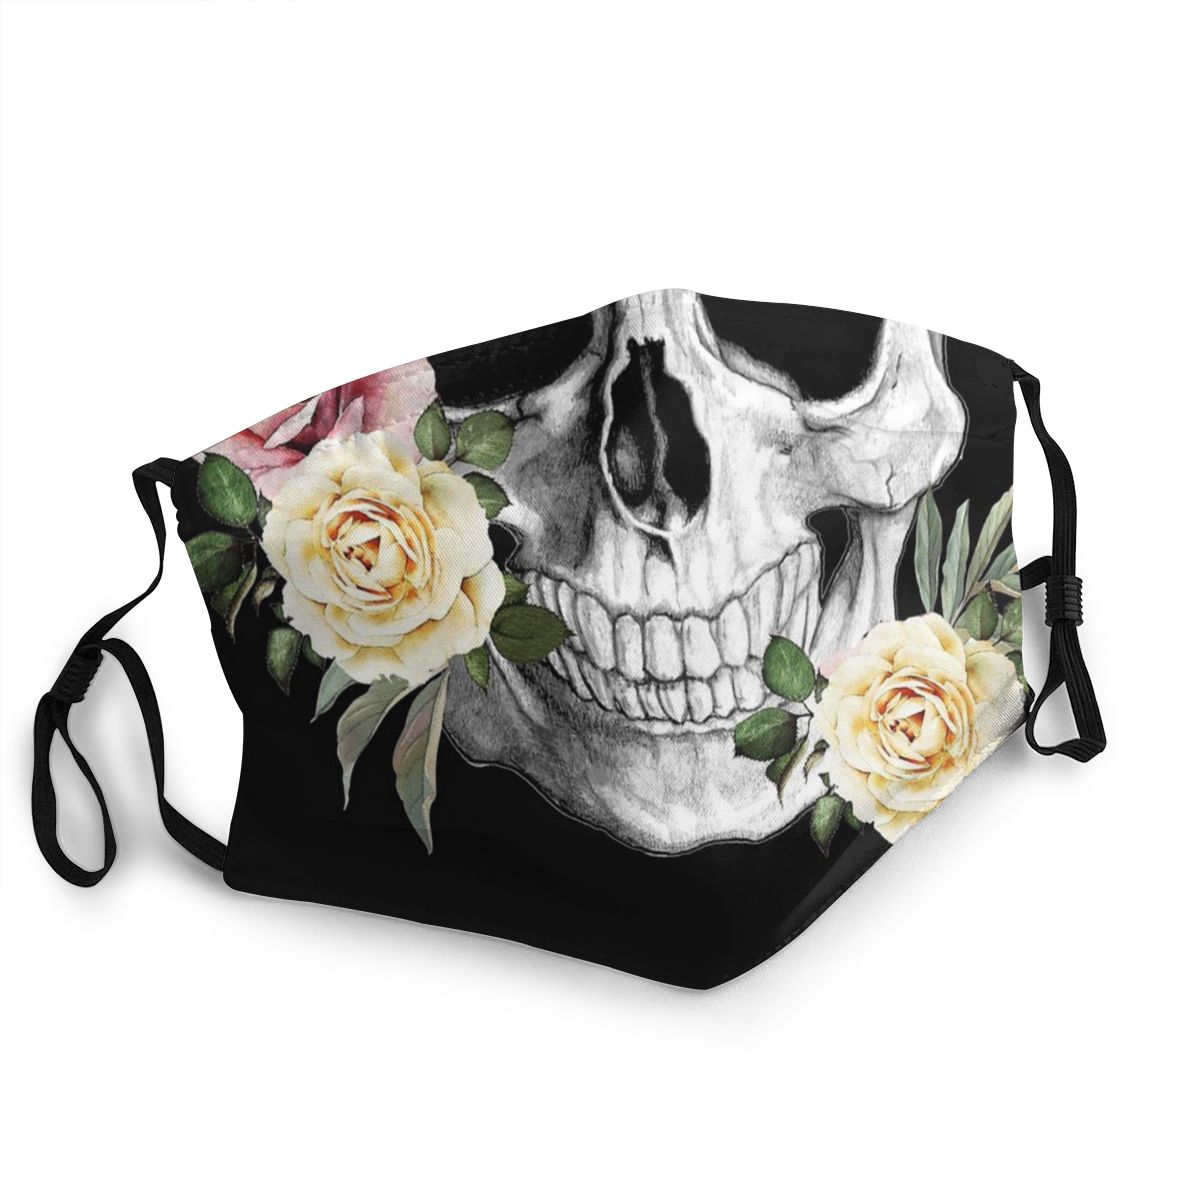 Skull Skeleton Roses Unisex Reusable Face Mask Anti Bacterial Dust Protection Cover Respirator